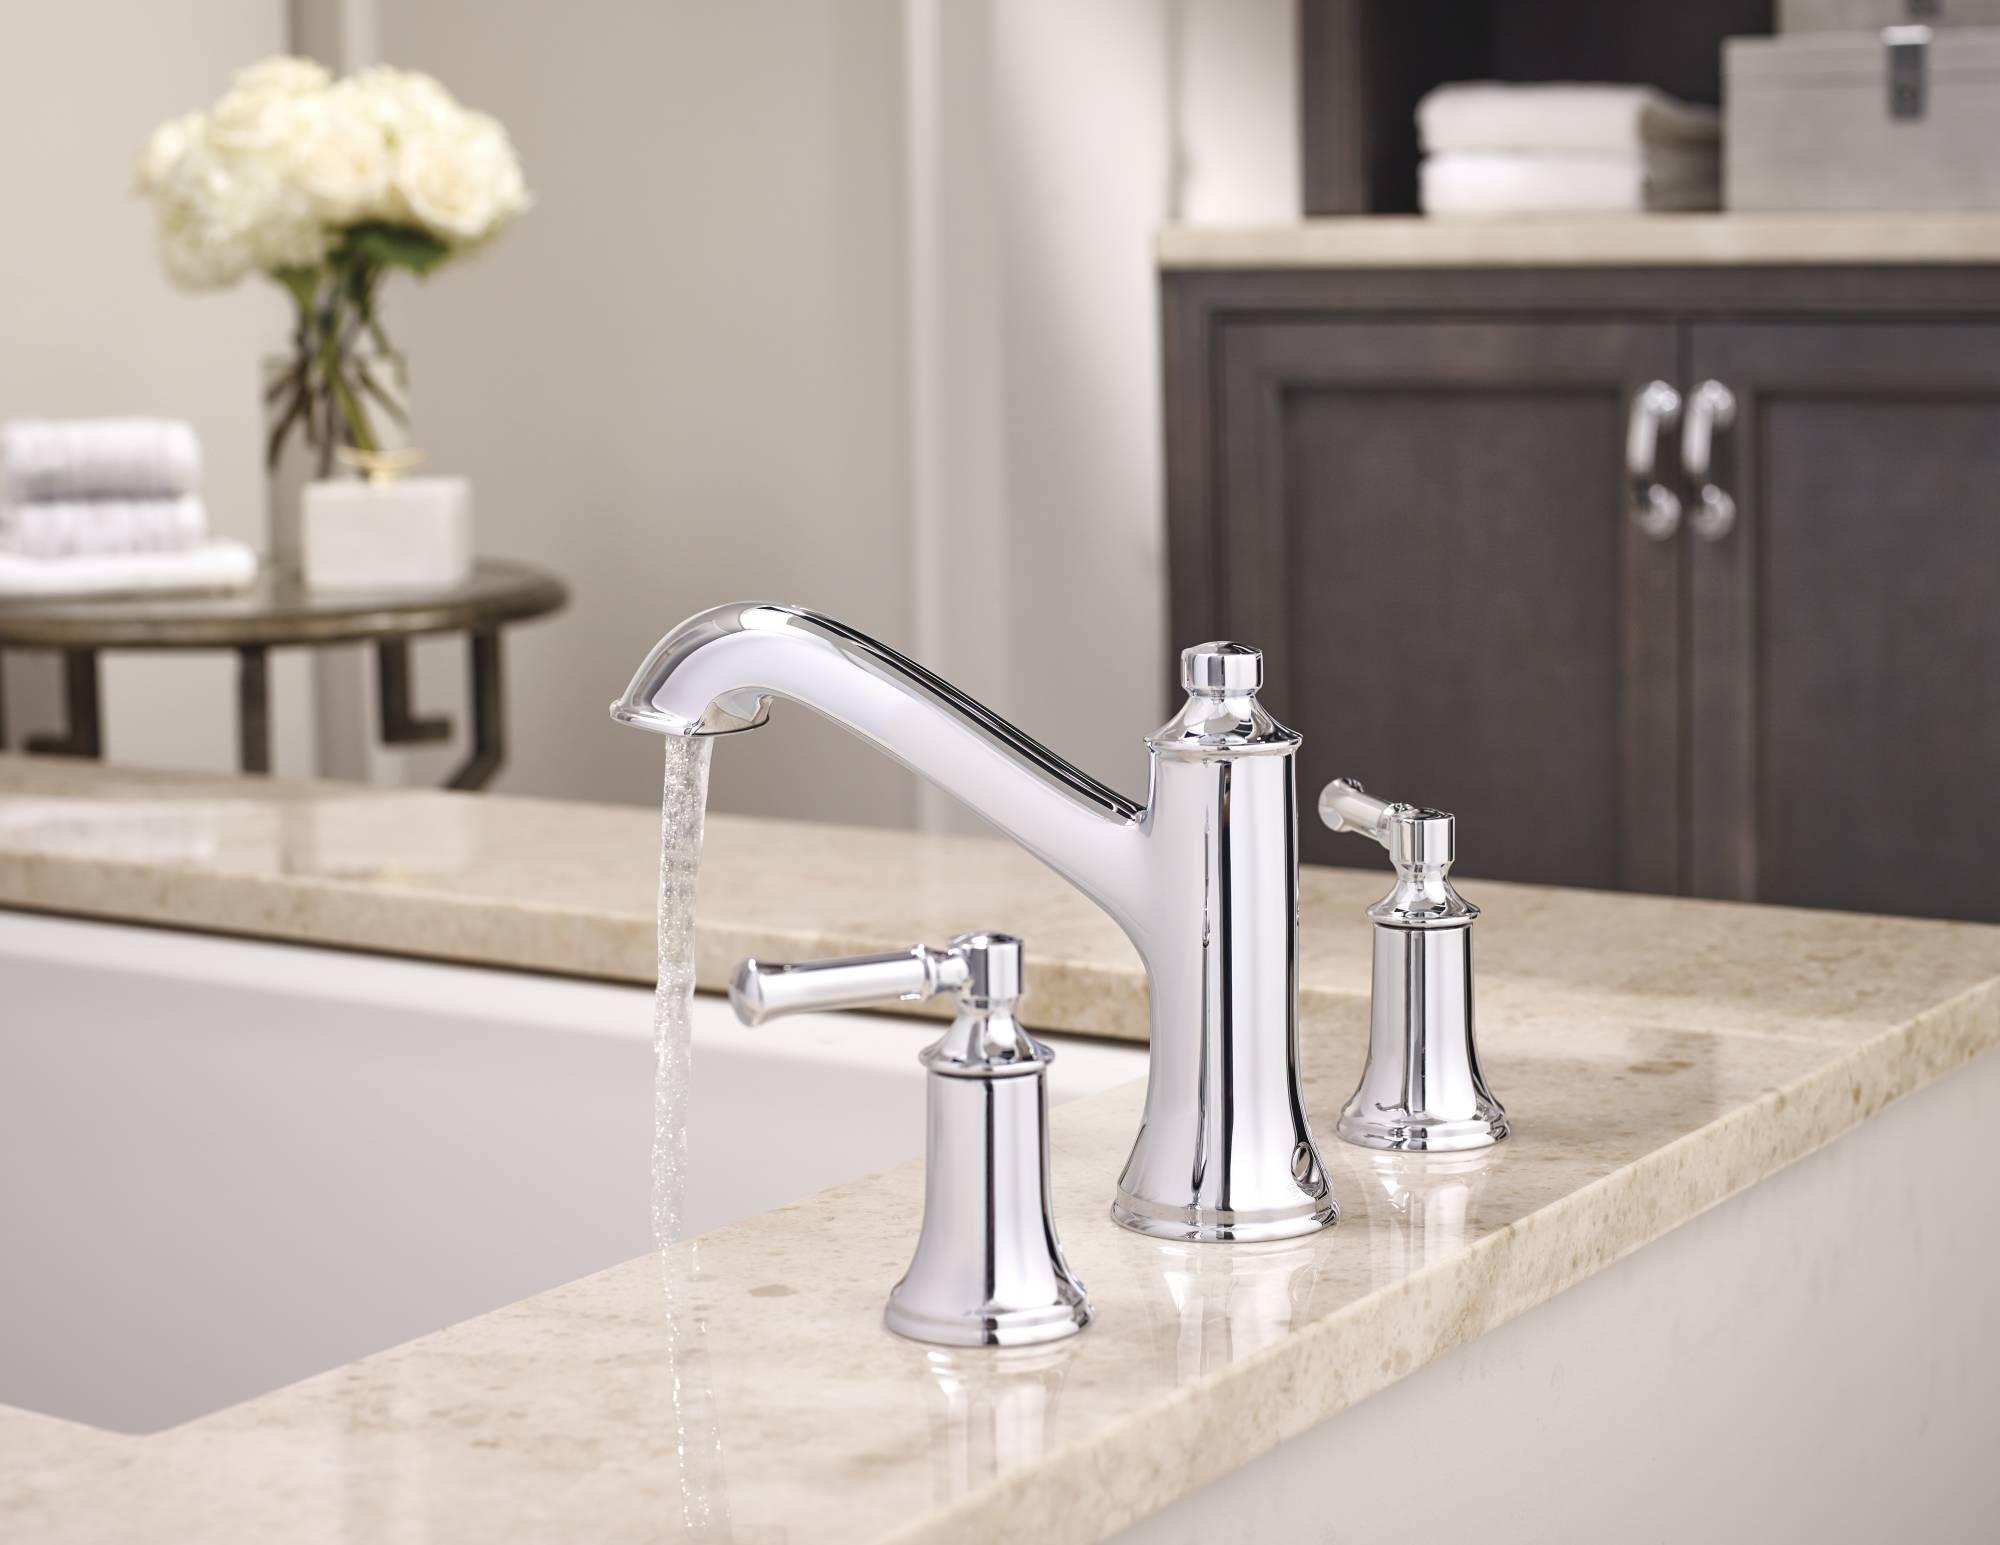 New Moen 174 Dartmoor Bath Suite Provides Fresh Take On